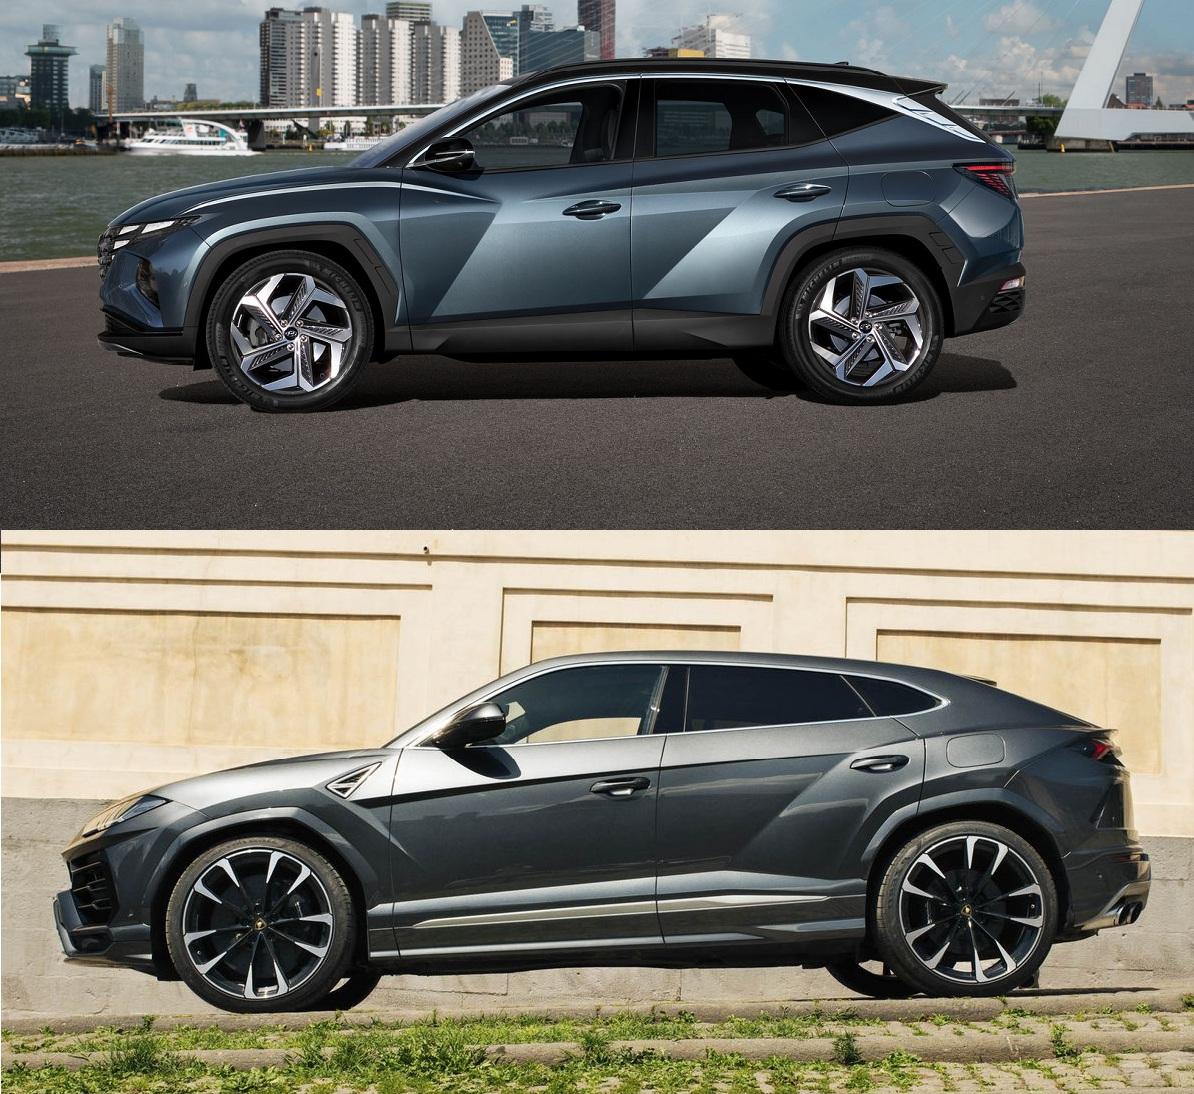 Новый Hyundai Tucson стал симбиозом Lamborghini Urus и Lexus UX - Обзор